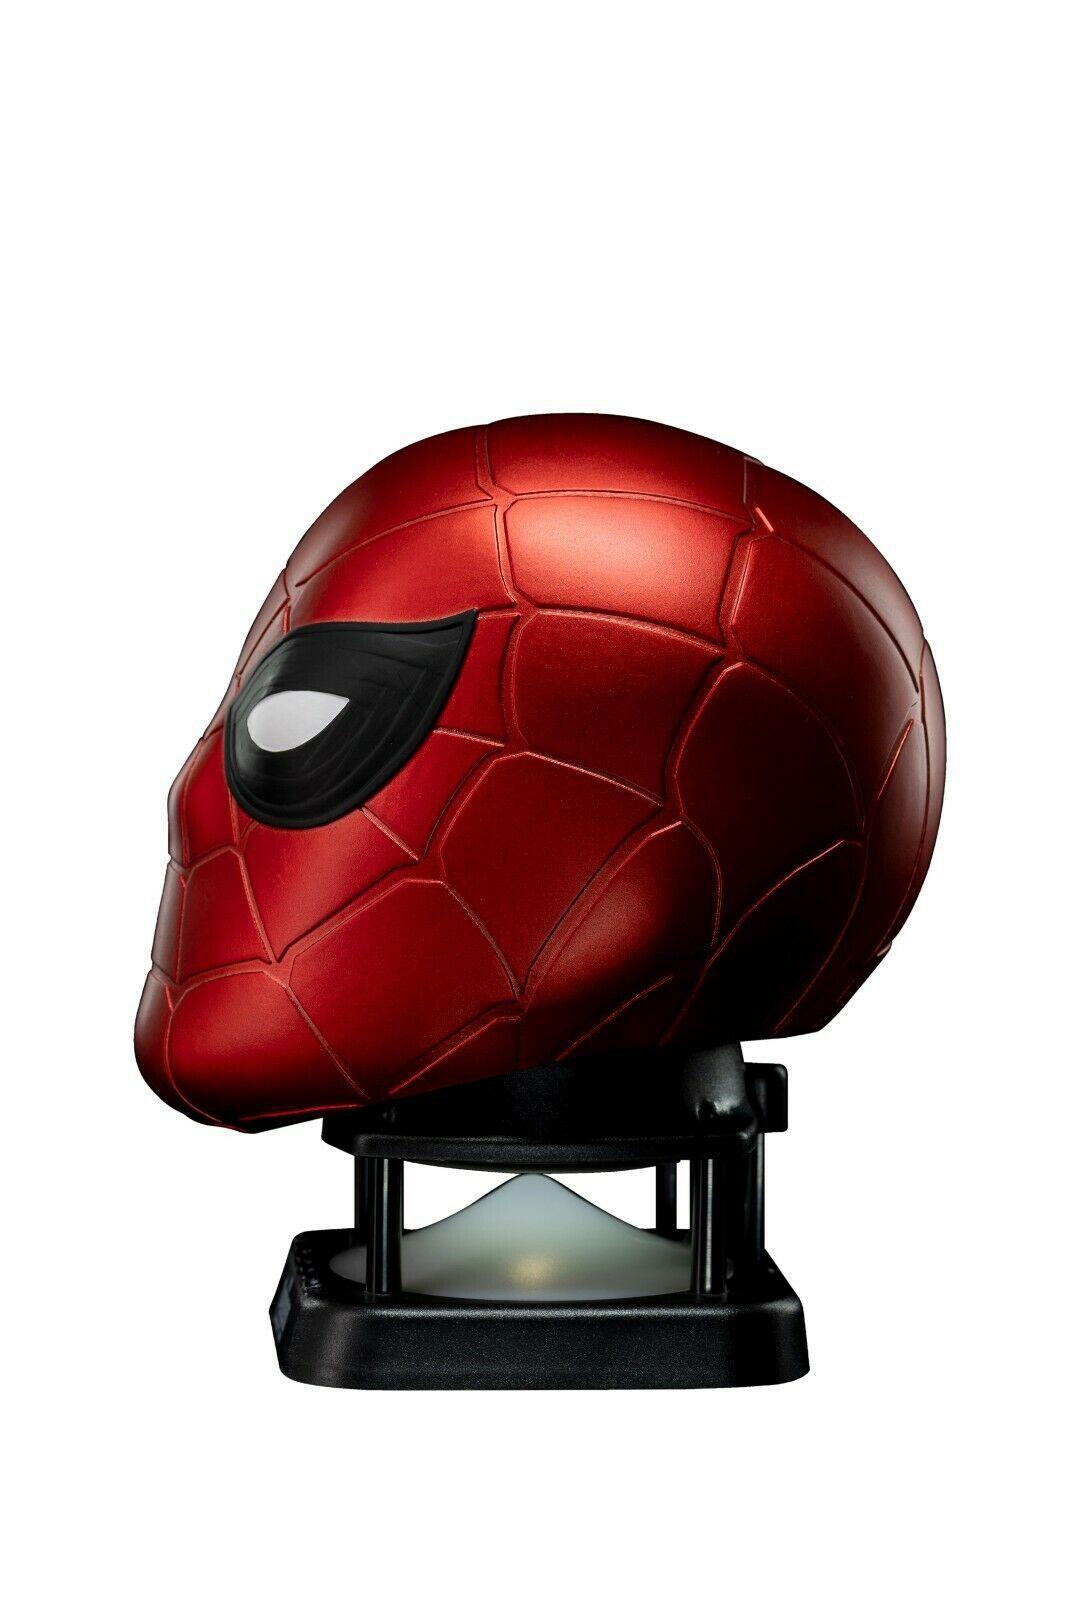 Caixa de Som Homem-Aranha (Spider-Man): Vingadores Guerra Infinita (Avengers Infinity War) - (BT Speaker)